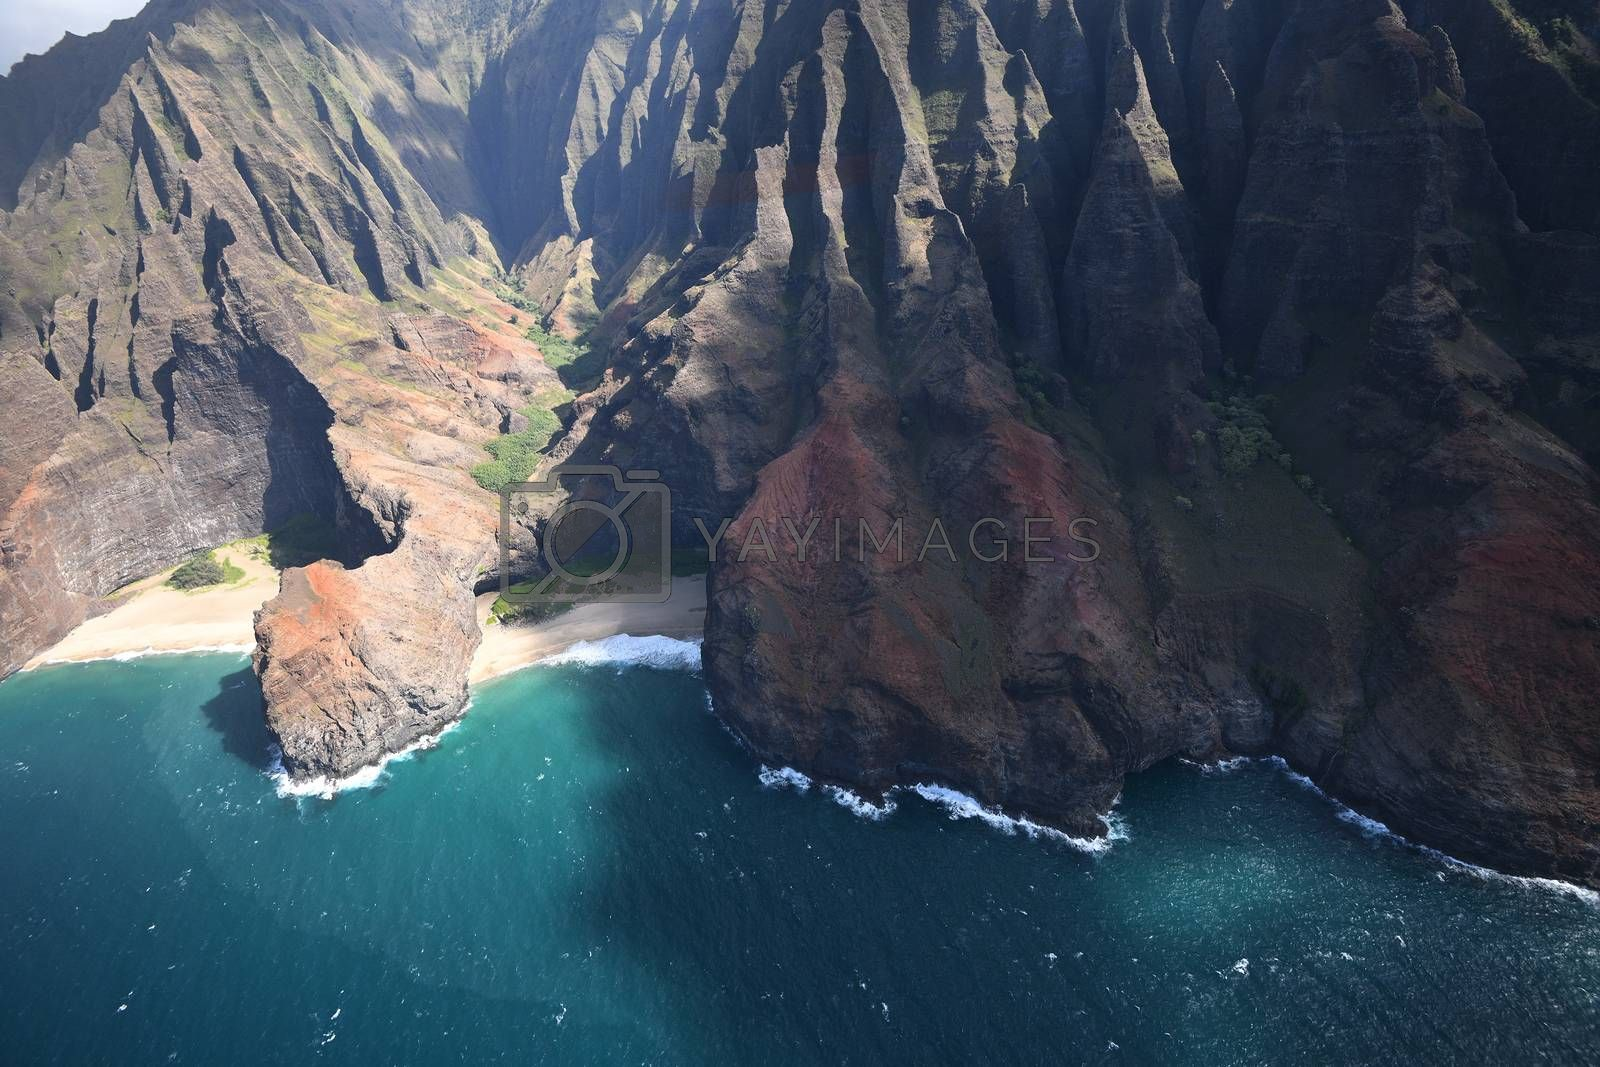 Royalty free image of Kauai coast landscape by porbital